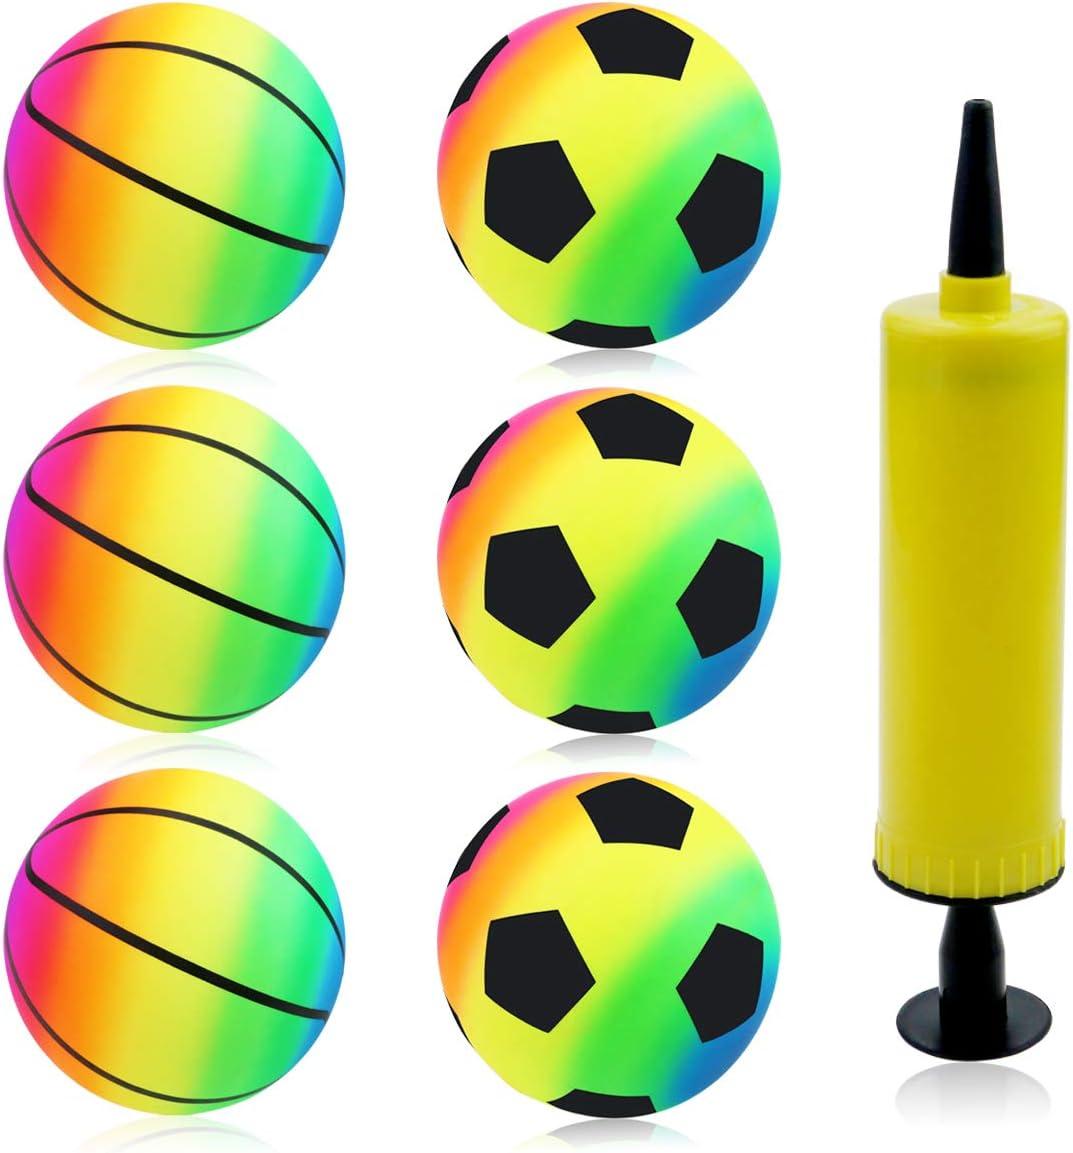 MotBach 6 Pack 6 Inch Rainbow Sports Ball, Inflatable KickBalls Playground Ball Handball Game with Air Pump for School, Home, Outside Activities(Random Pattern)